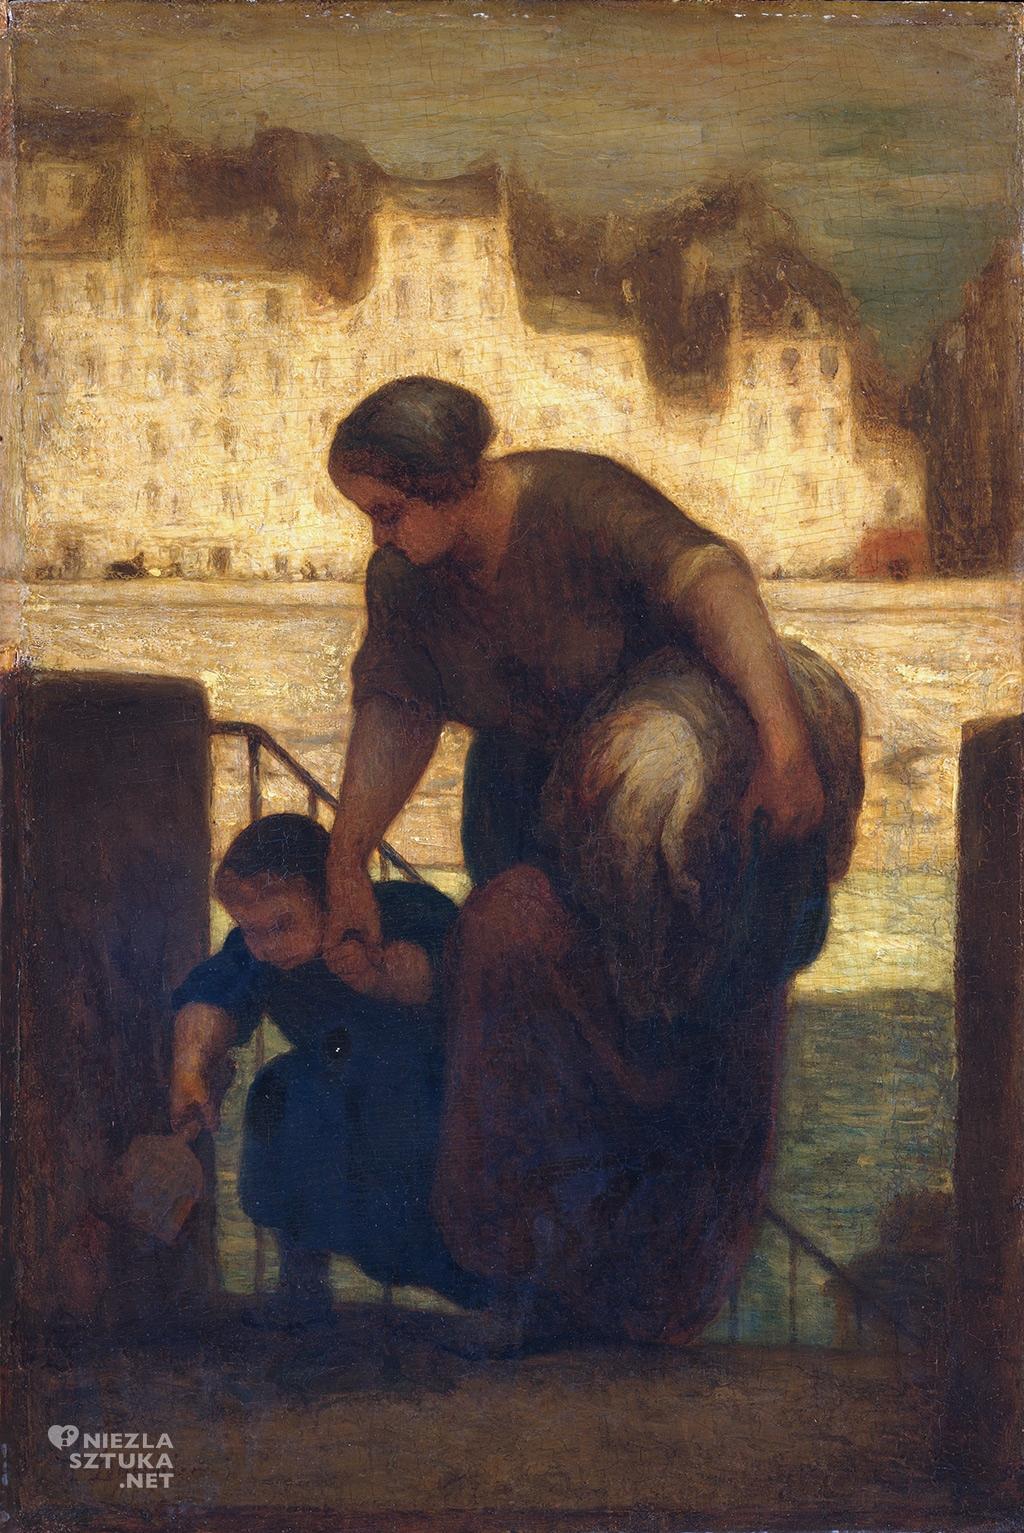 Honoré Daumier, Praczka, realizm, sztuka francuska, malarstwo, Niezła Sztuka